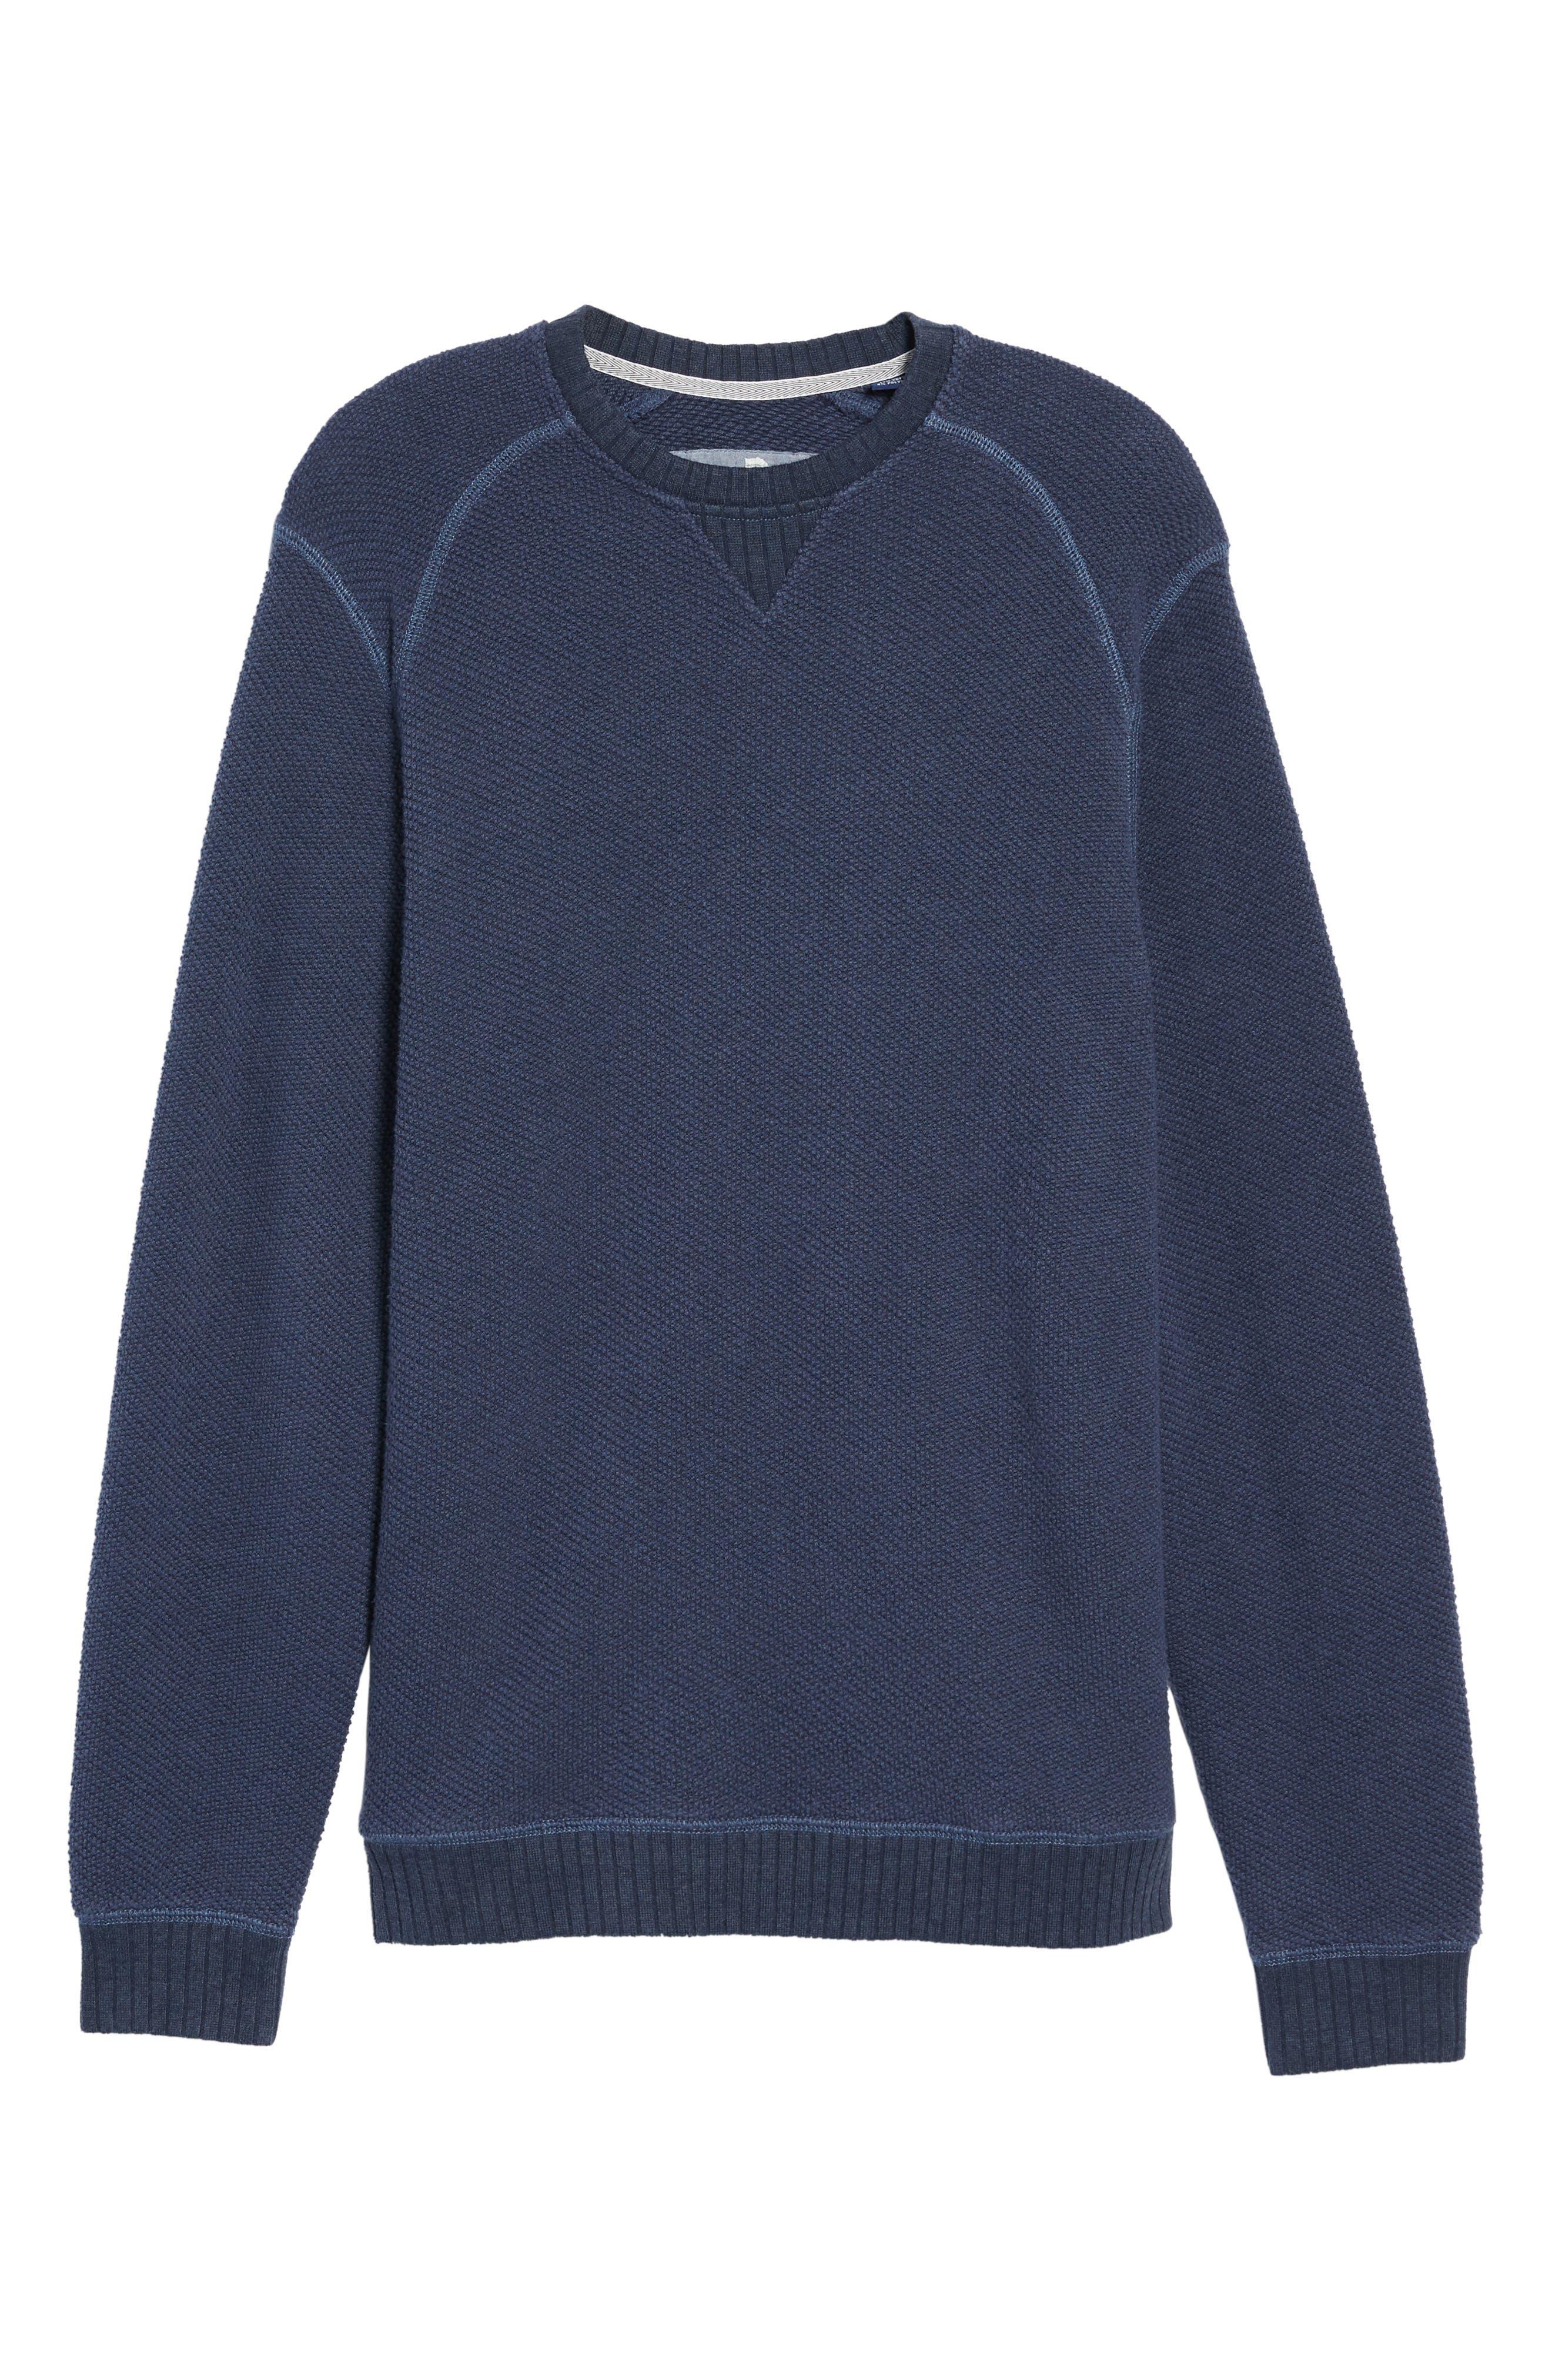 Surfari Crewneck Sweatshirt,                             Alternate thumbnail 6, color,                             001